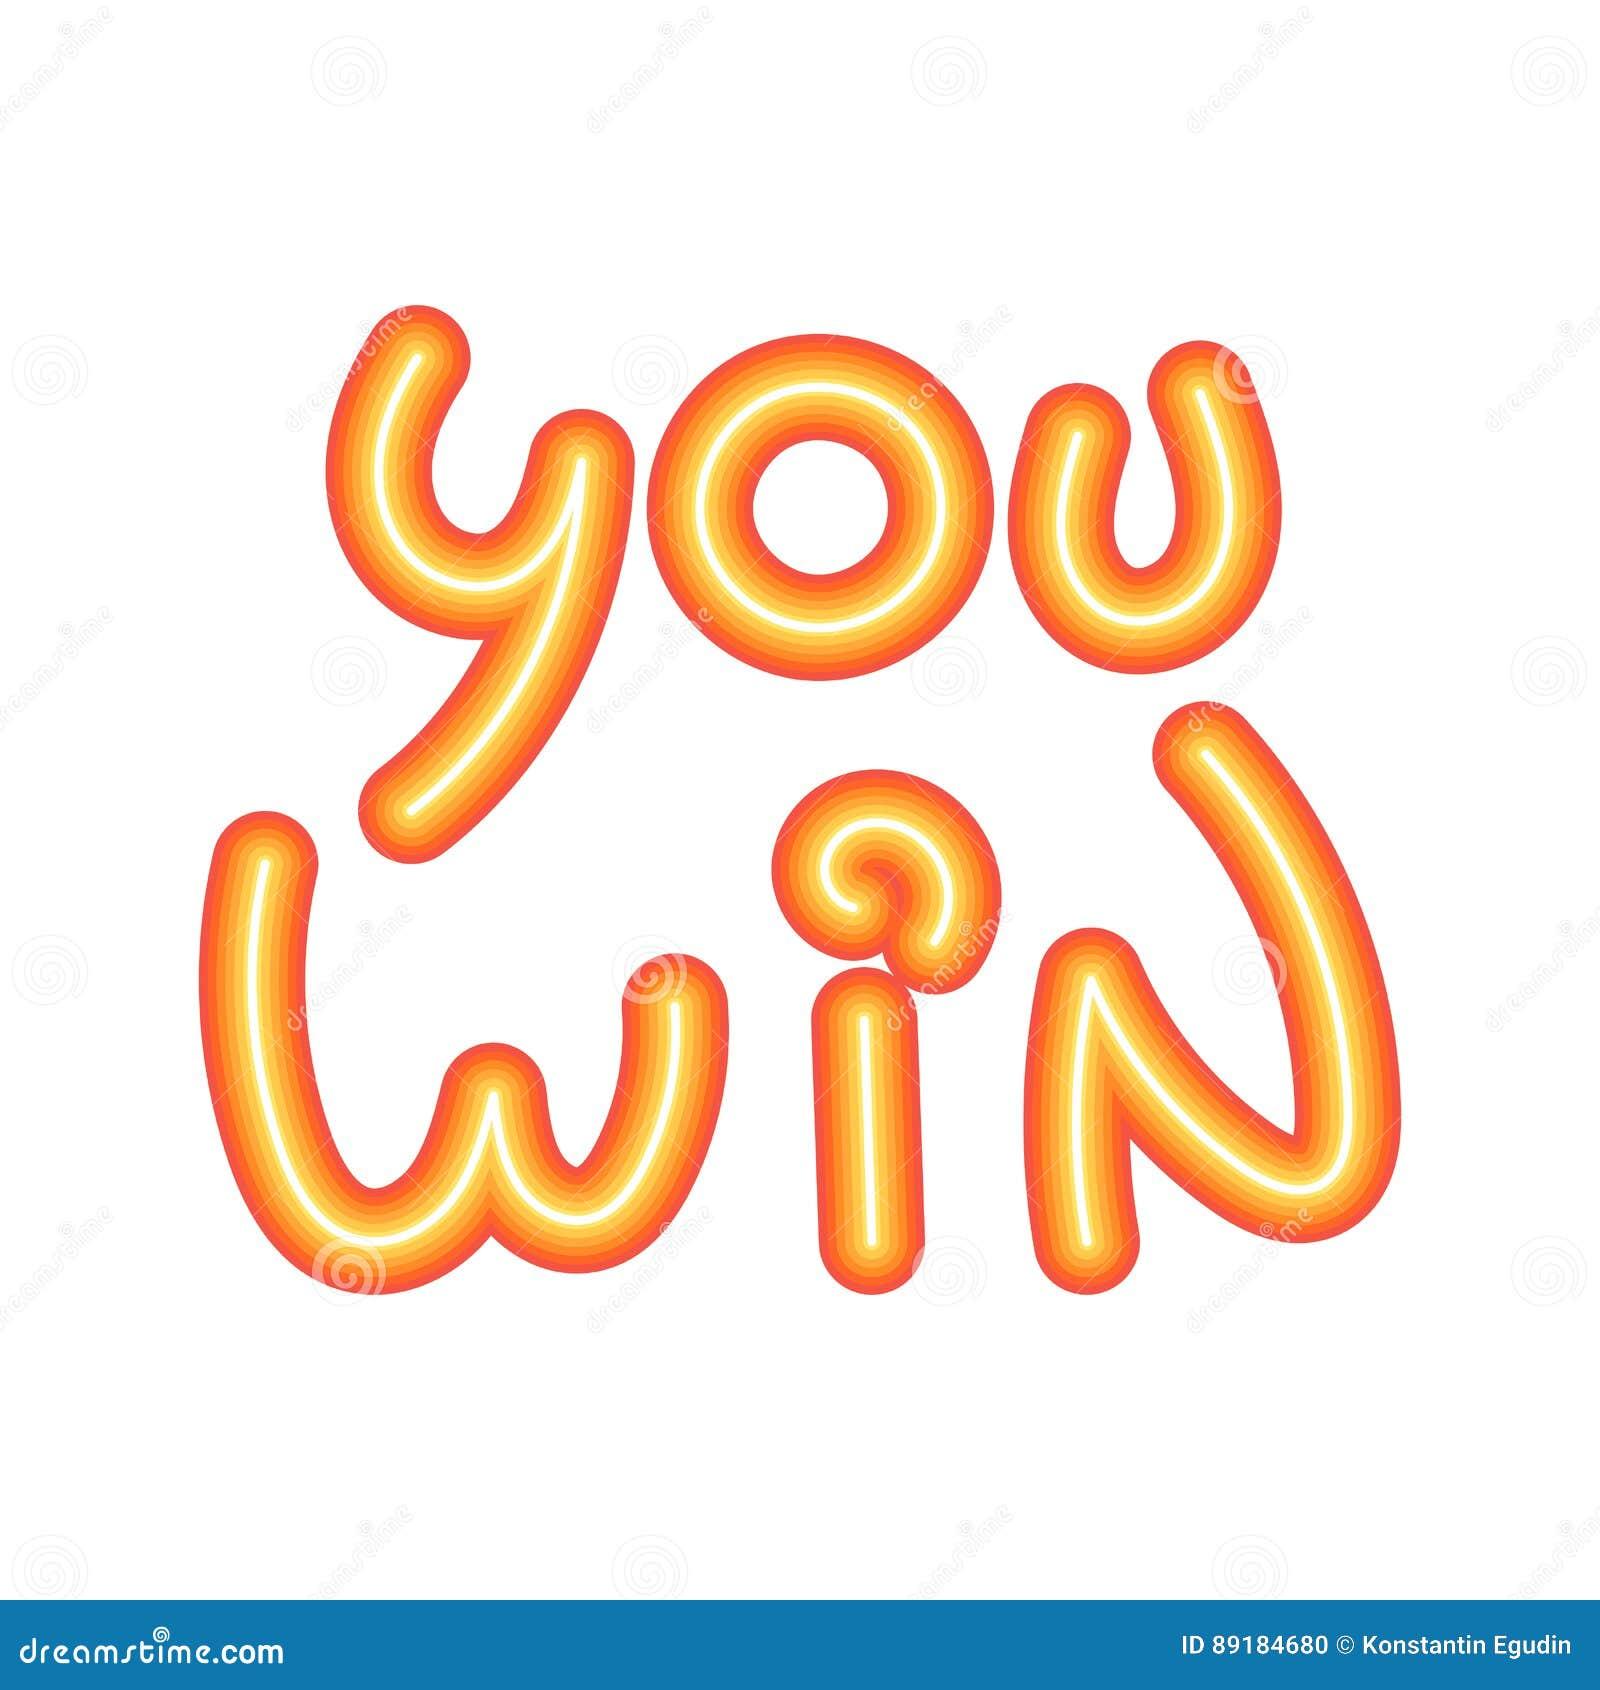 You Win, Congratulation Vector Illustration ...